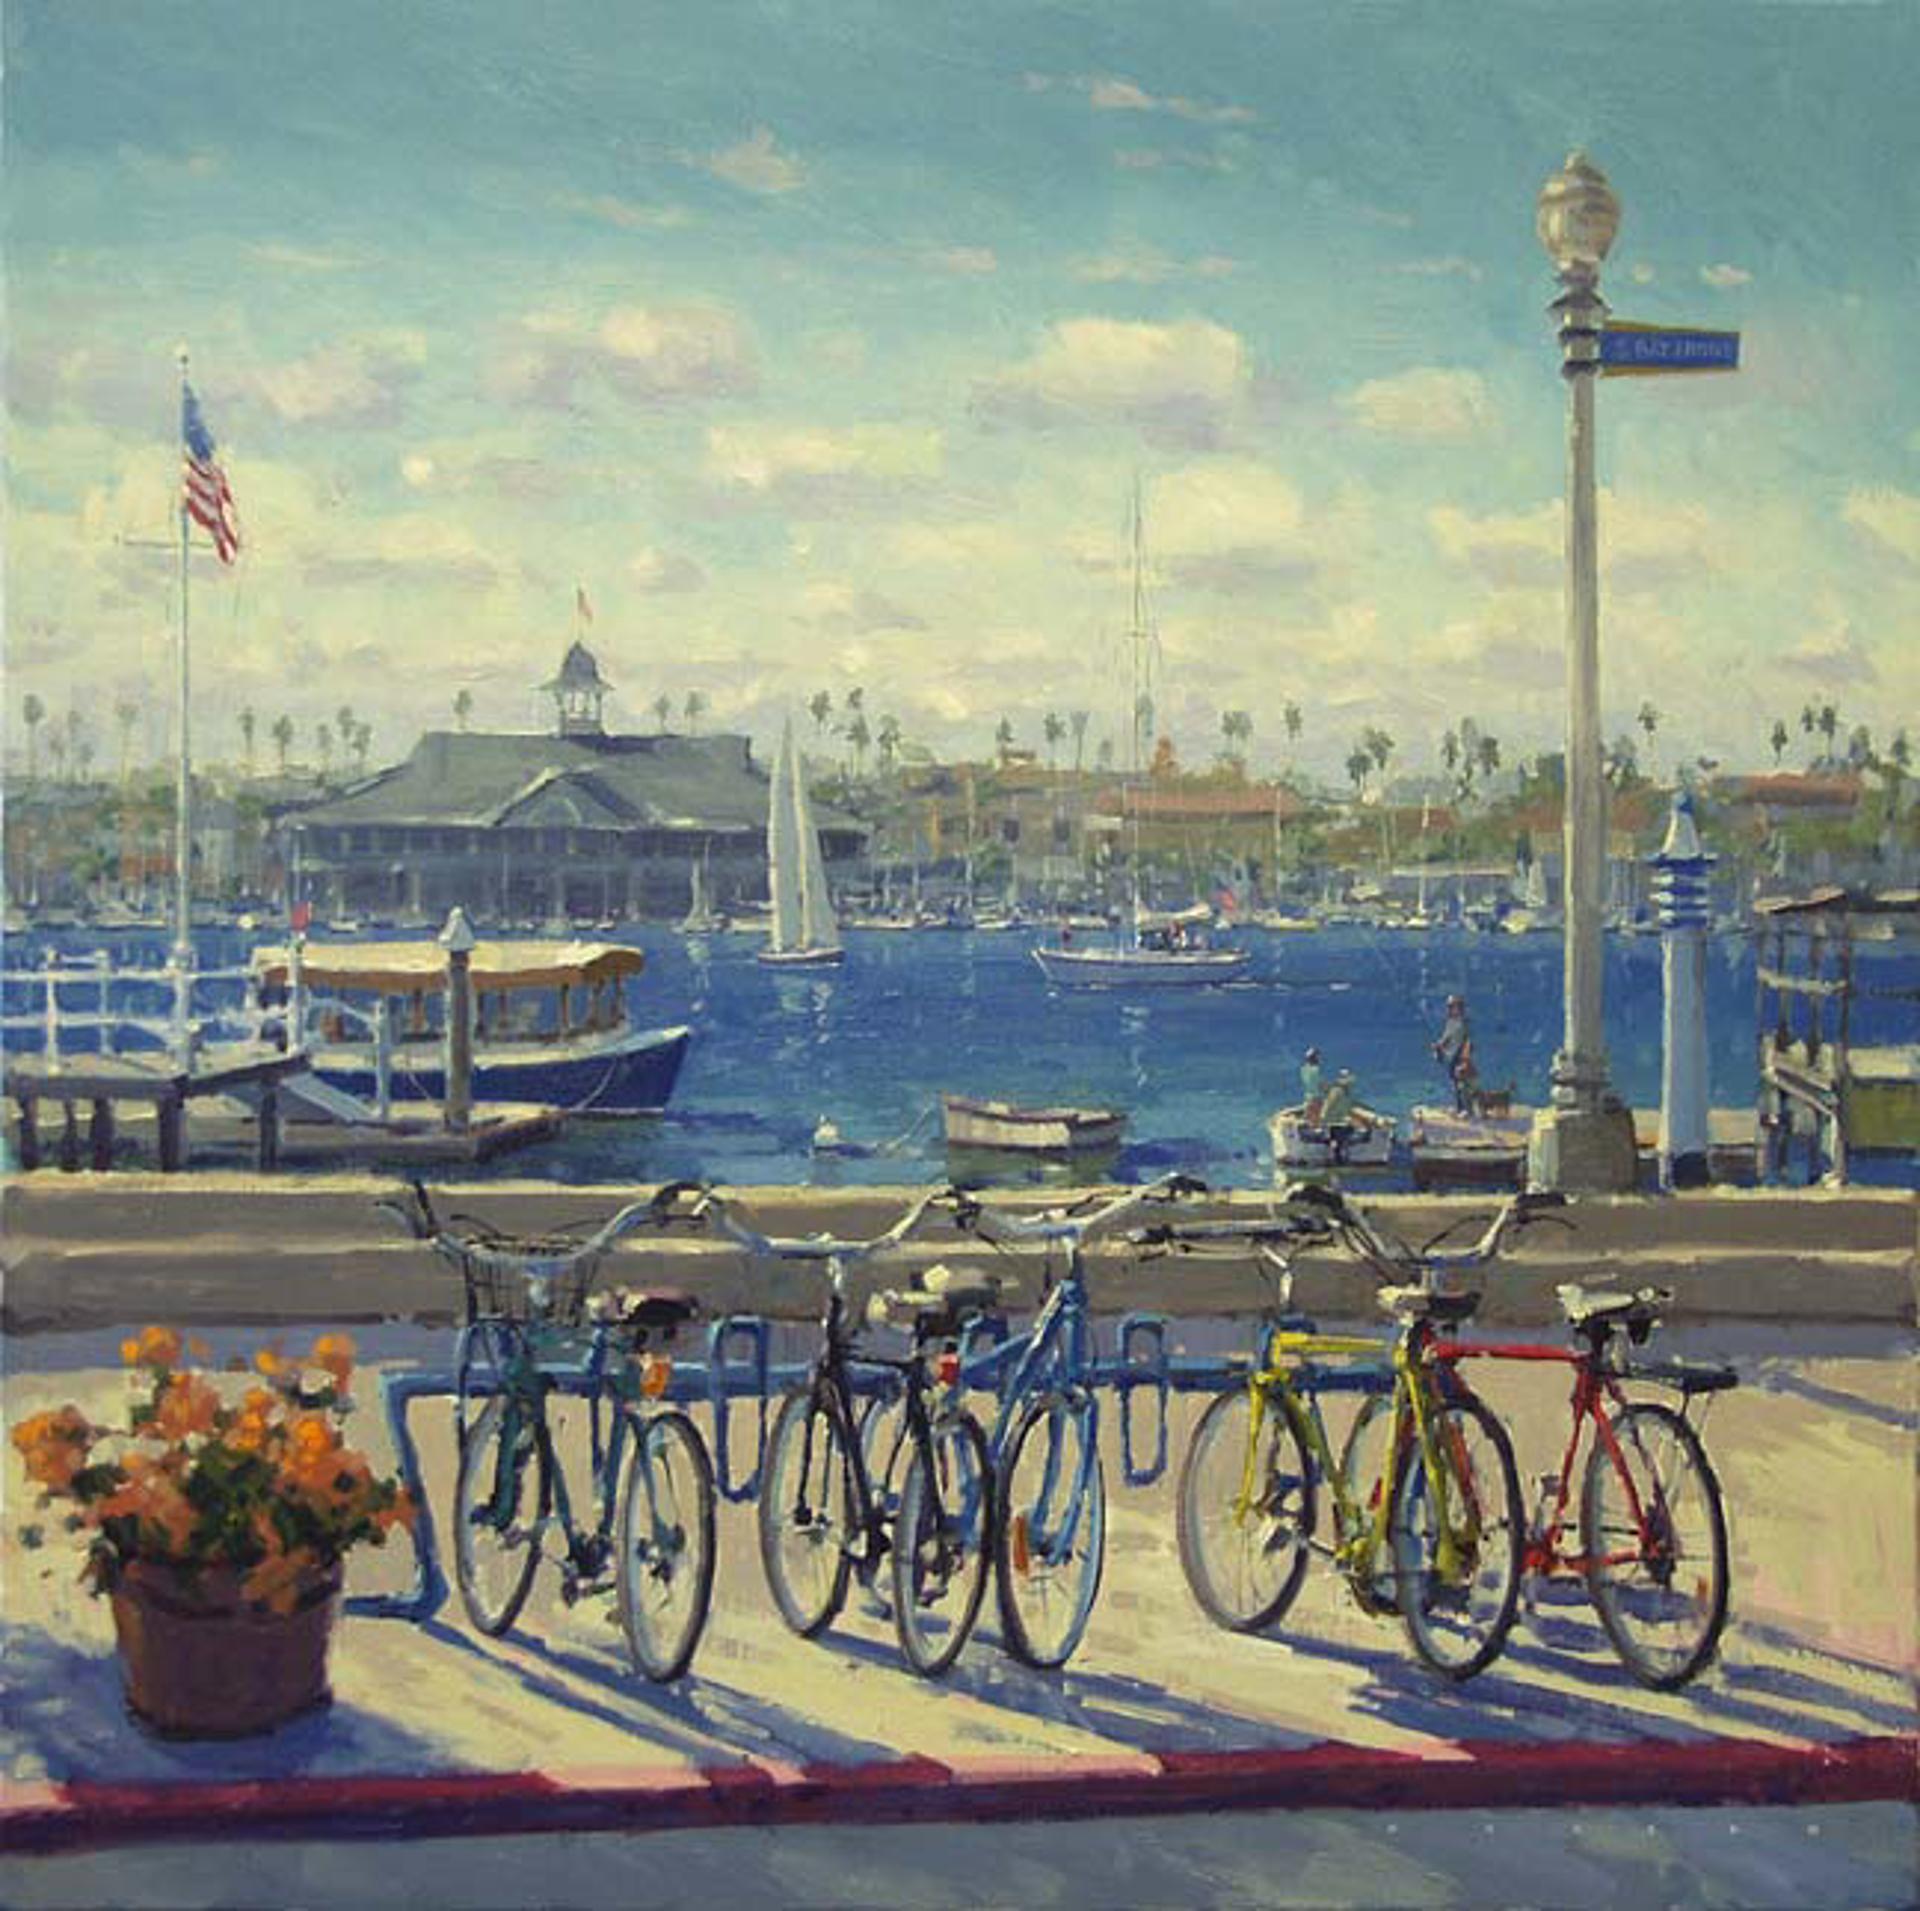 Bayfront Cruisers by Ronaldo Macedo